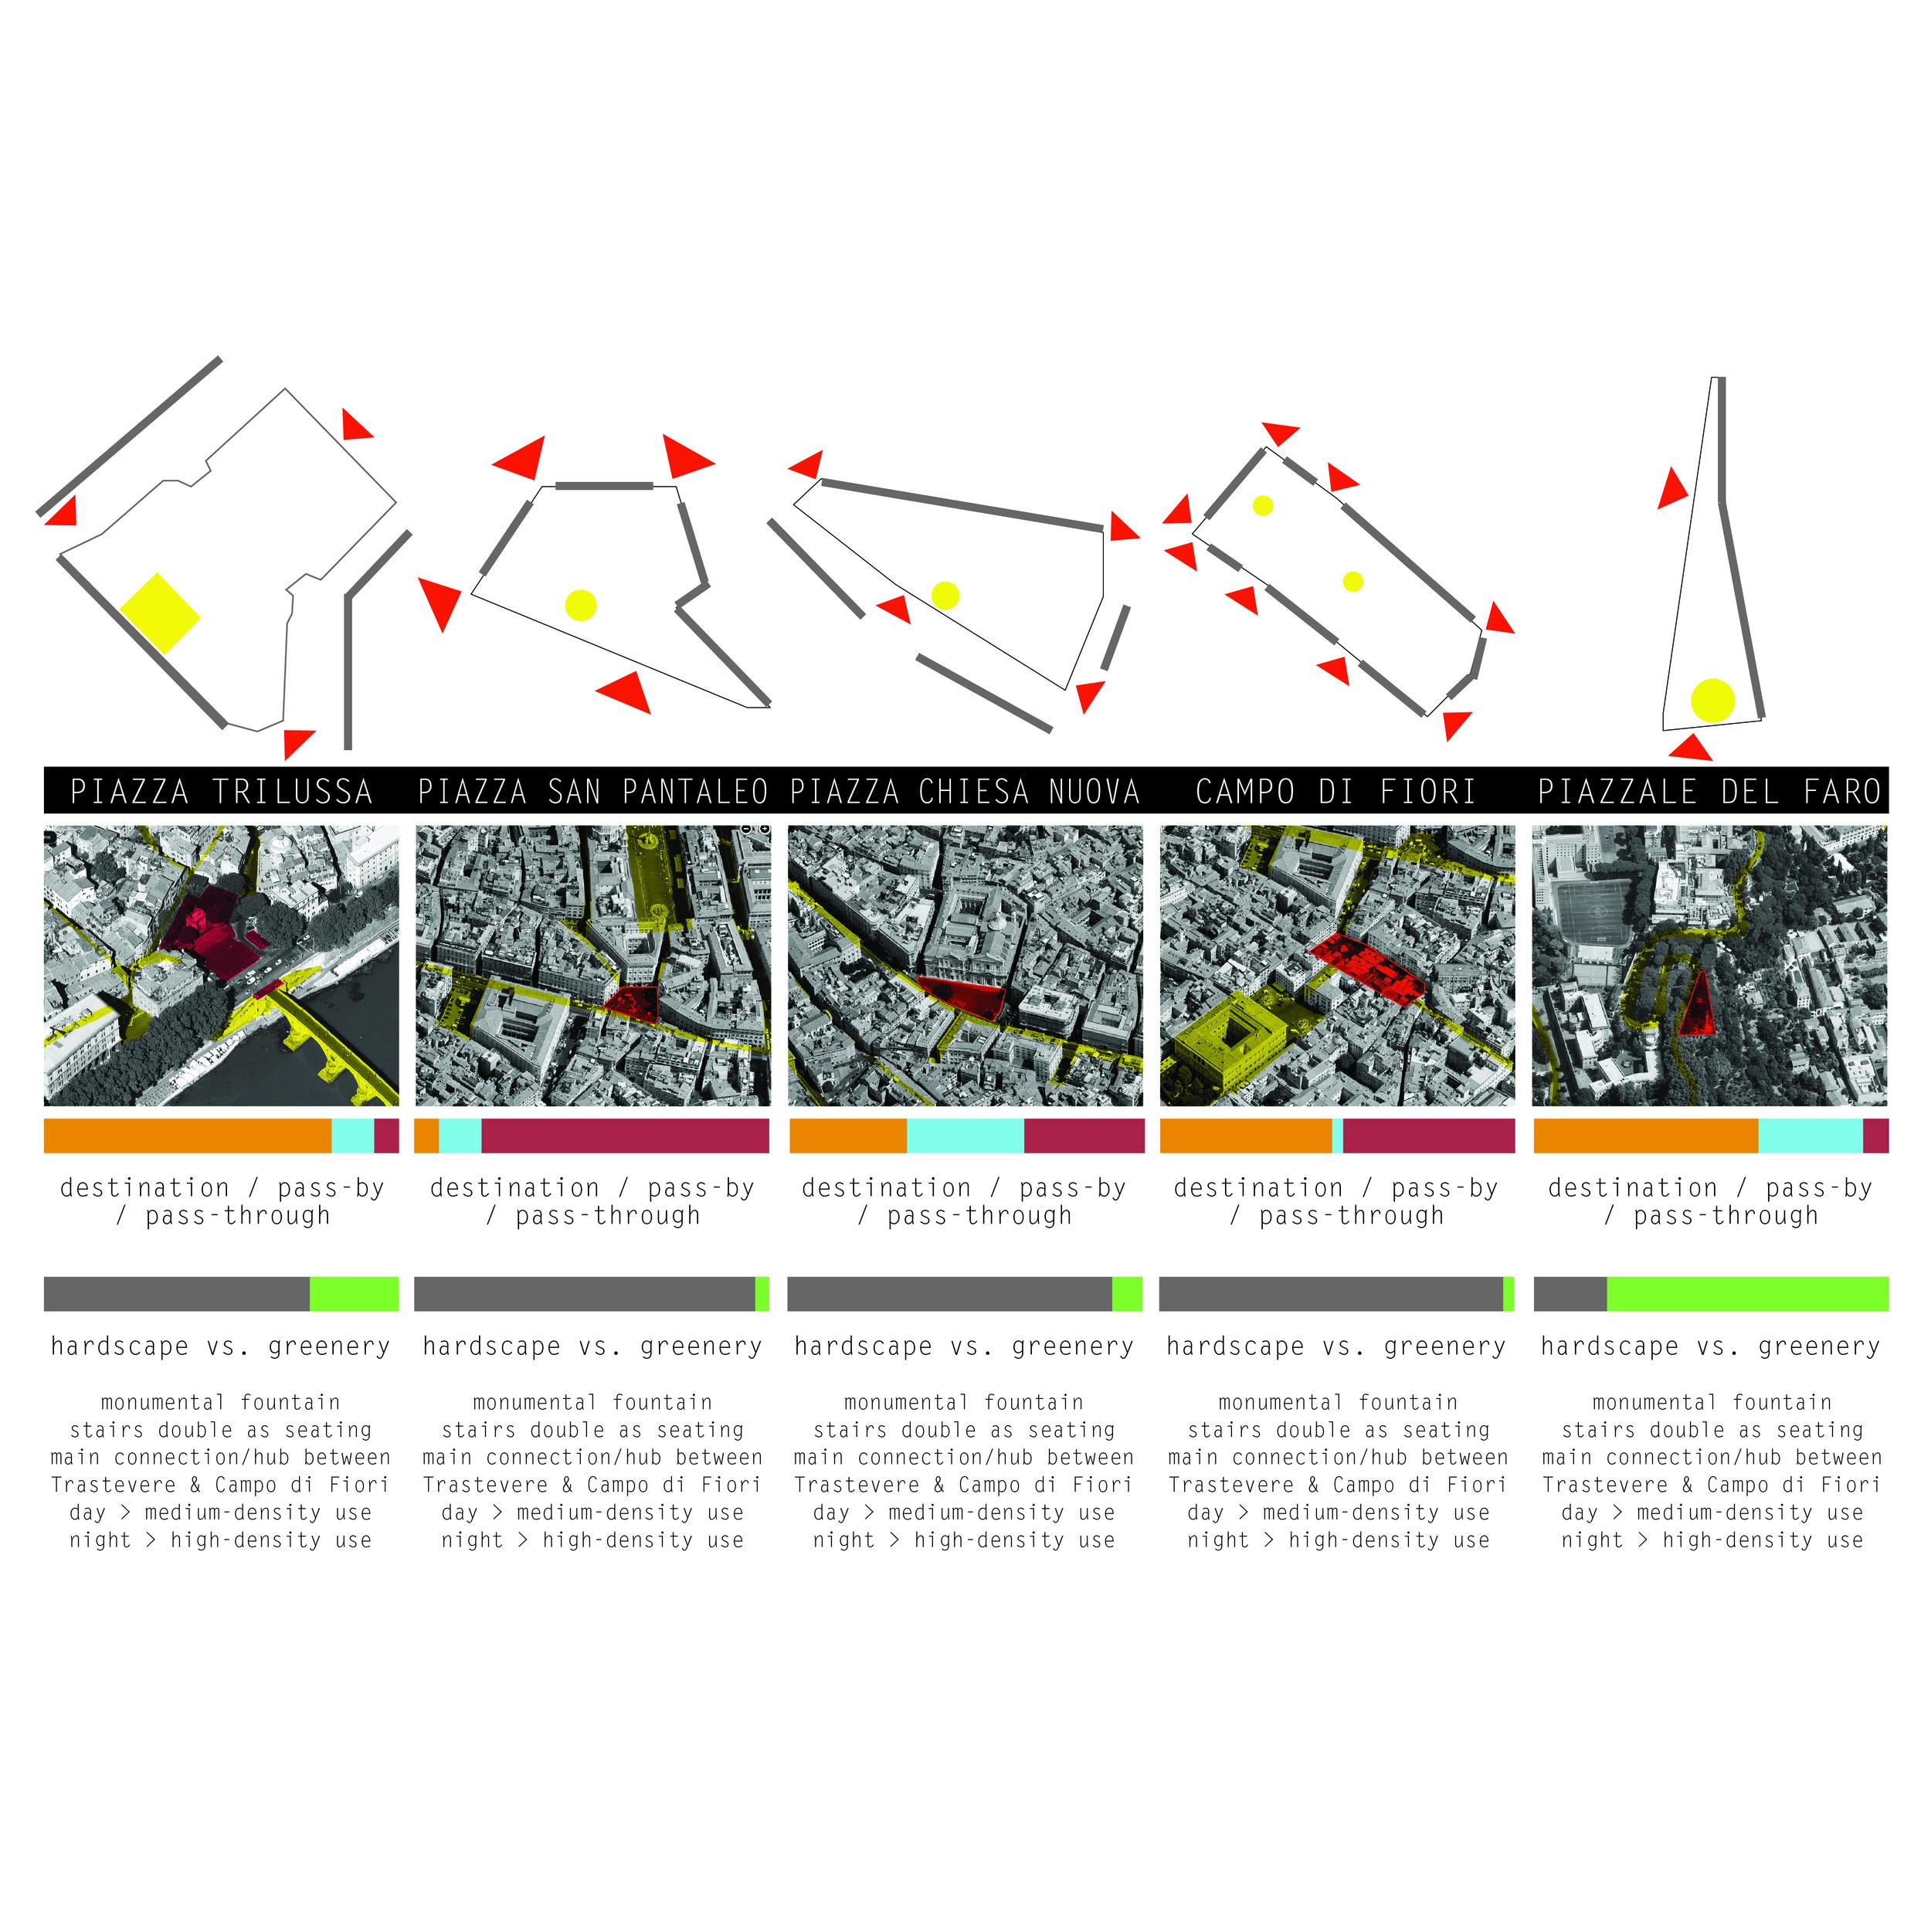 study: piazza typology analysis